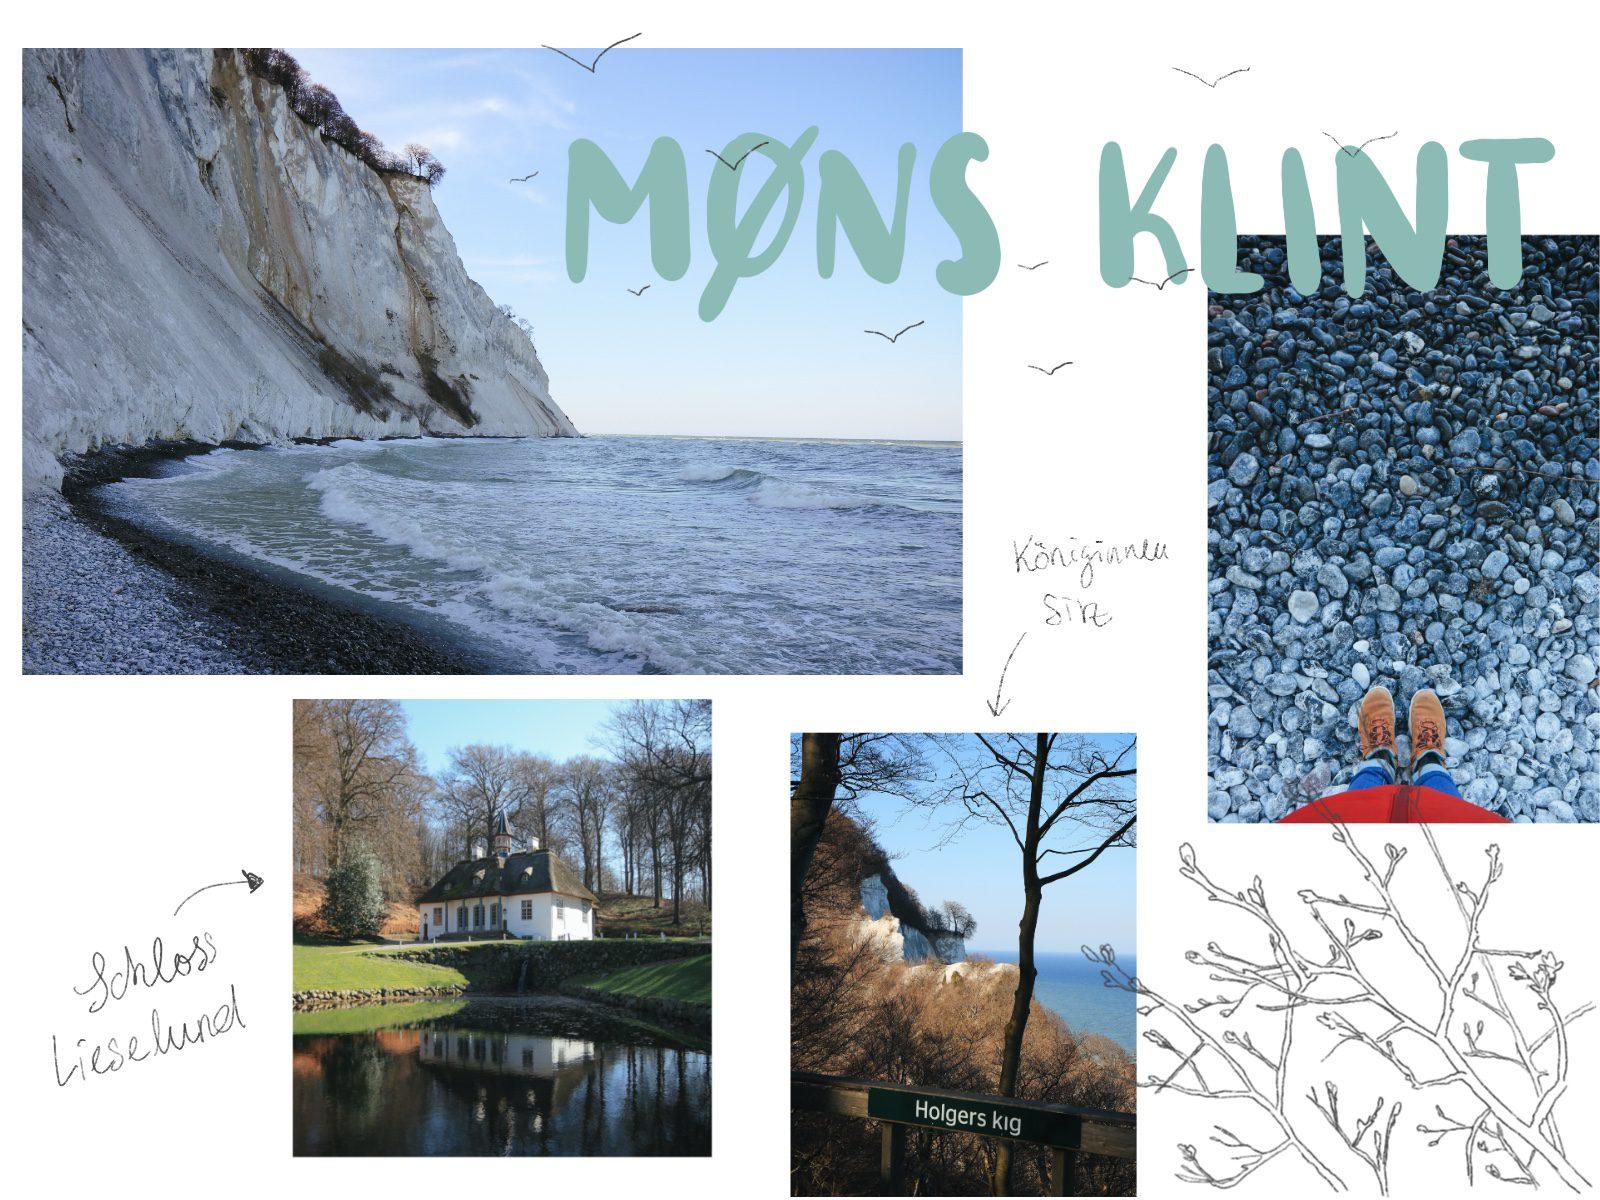 Dänemark Seeland Mons Klint Kreidefelsen Liselund